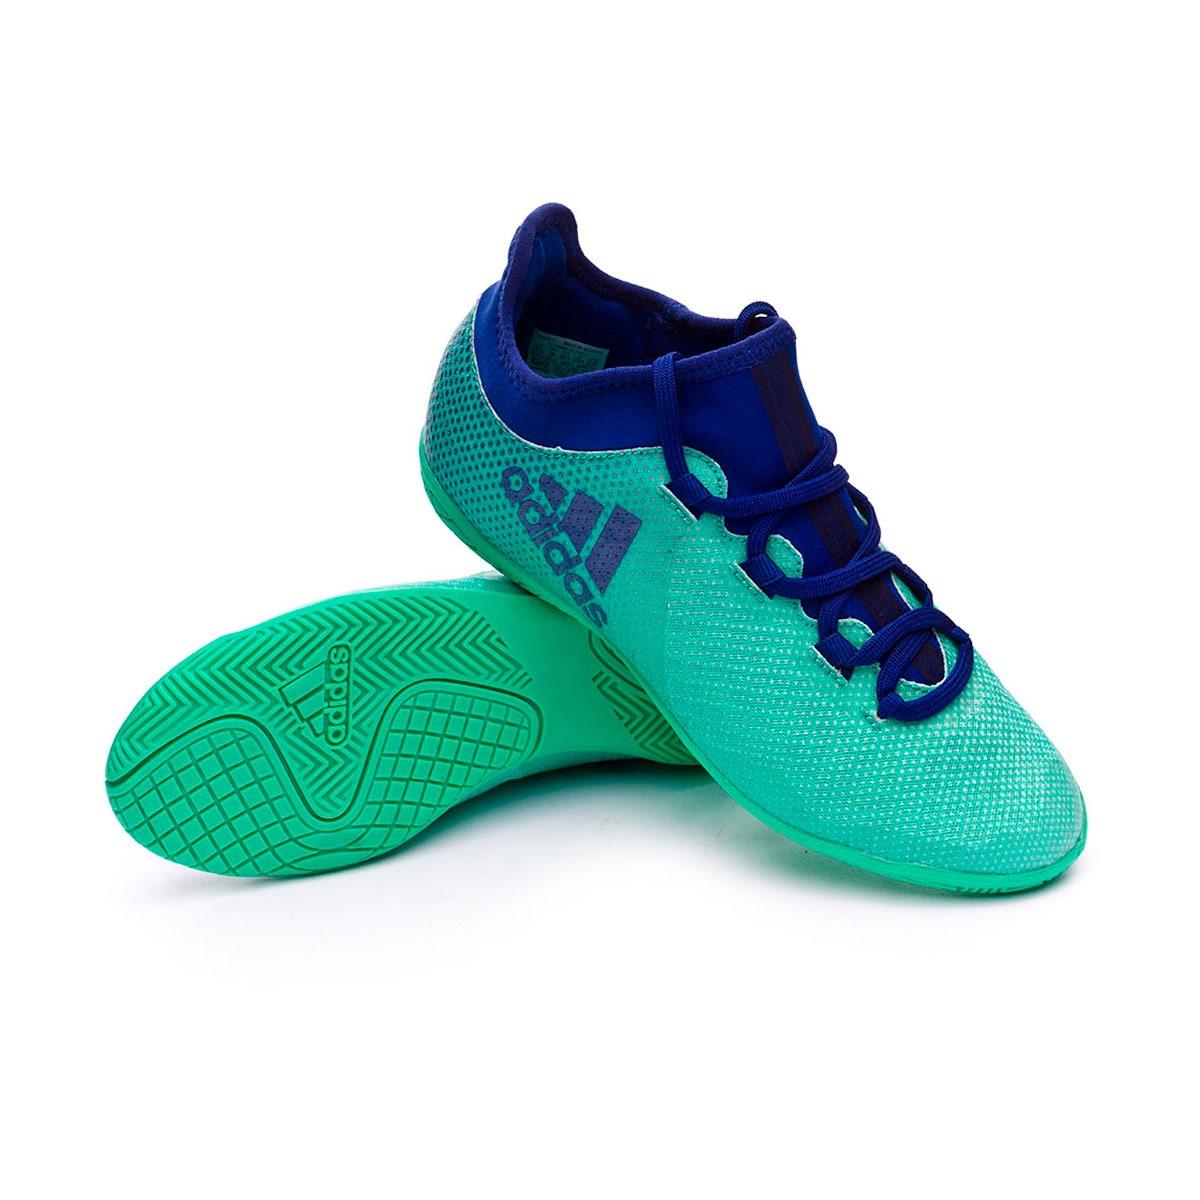 5c6b881fb Sapatilha de Futsal adidas X Tango 17.3 IN Crianças Aero green-Unity ink-Hi-res  green - Loja de futebol Fútbol Emotion